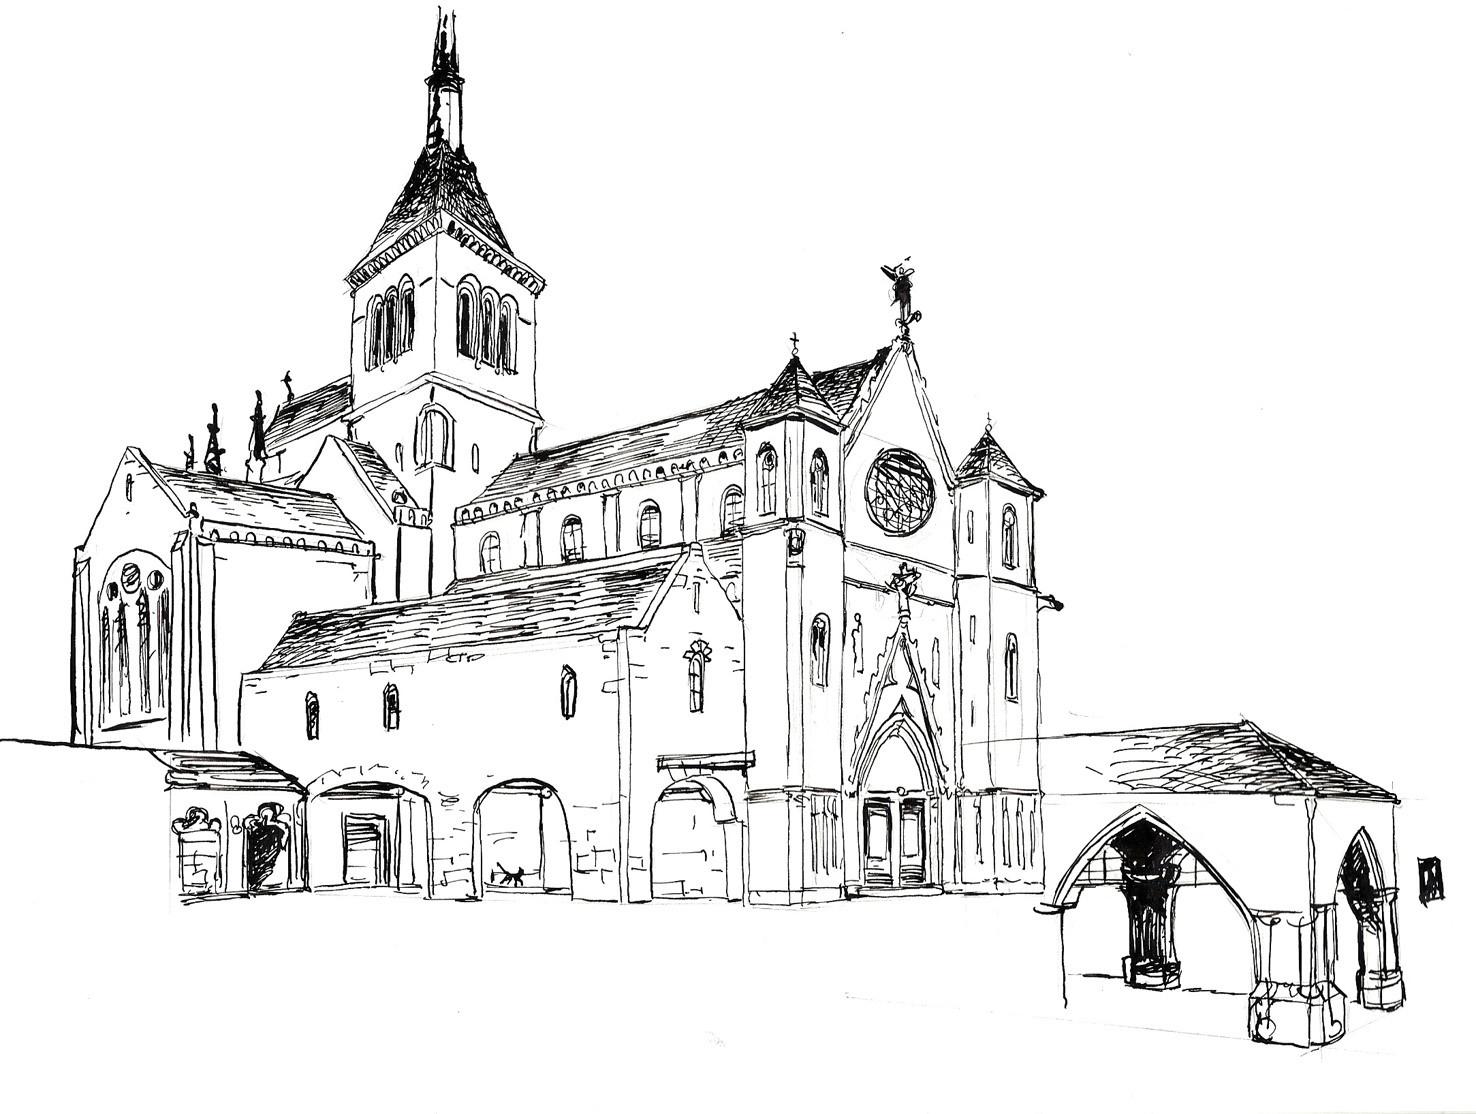 Yannick corboz msm abbaye1 s2